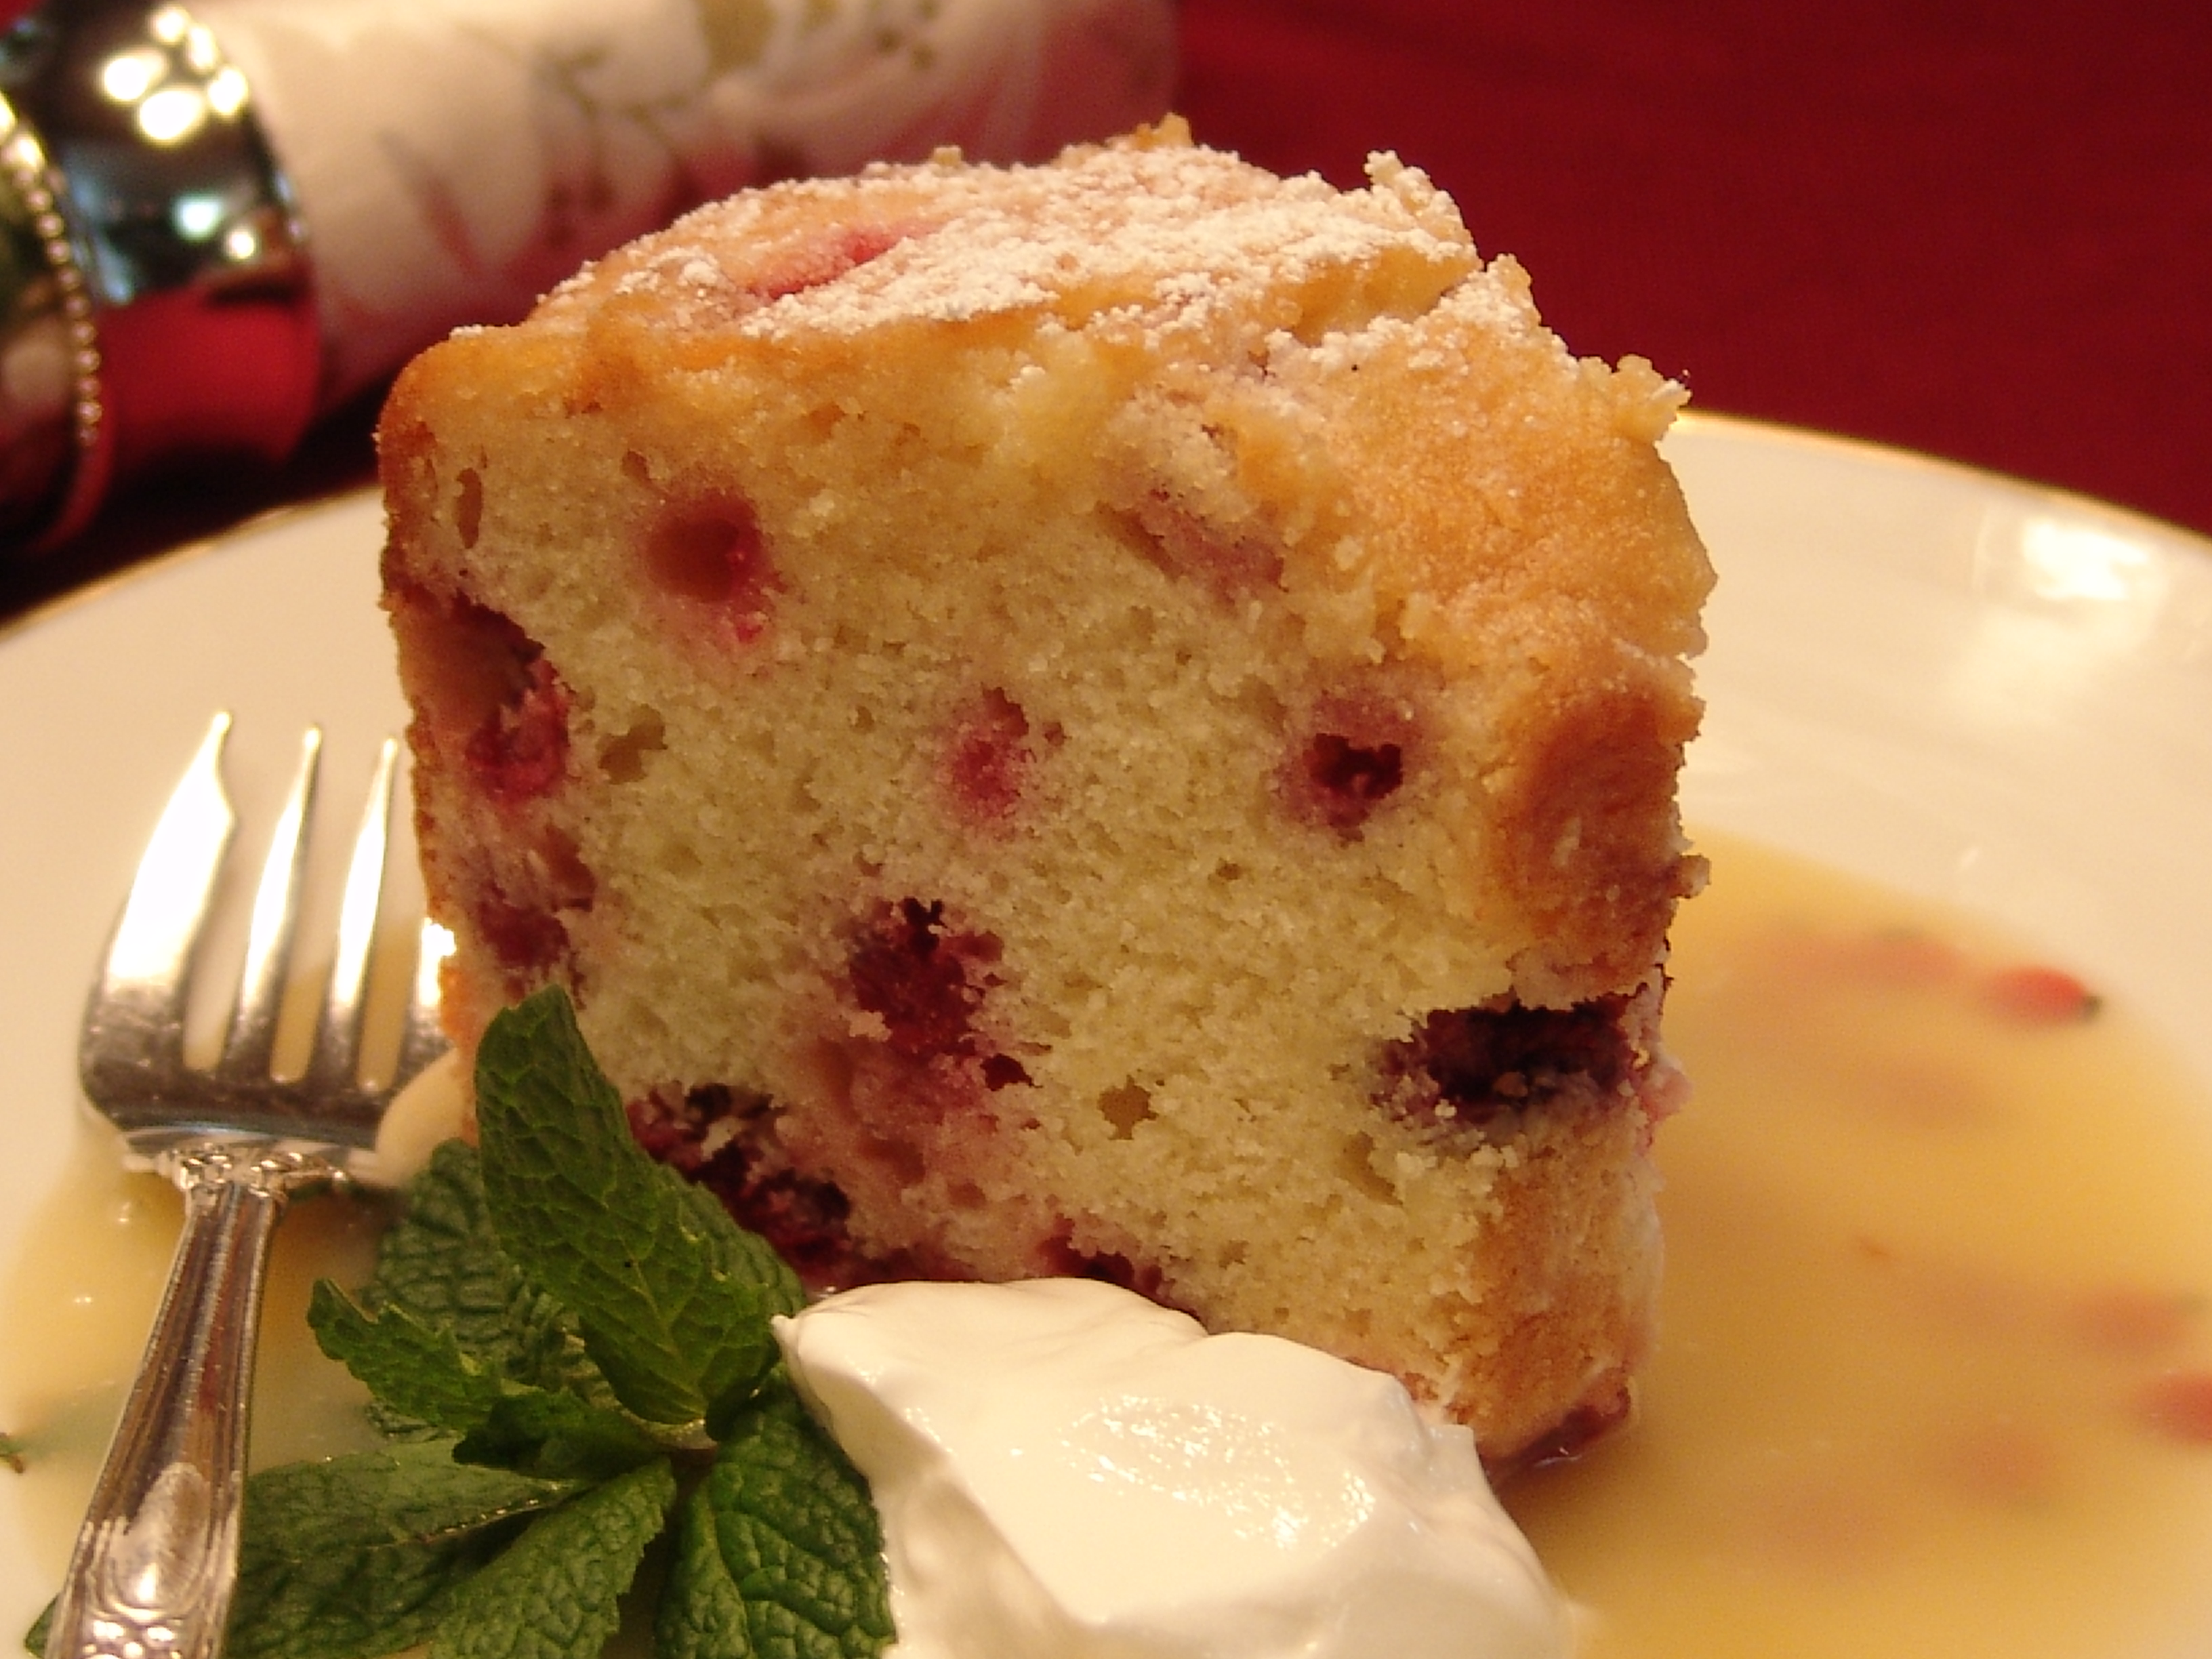 Cranberry Christmas Cake.Cranberry Christmas Cake 5starsinyourkitchen S Blog